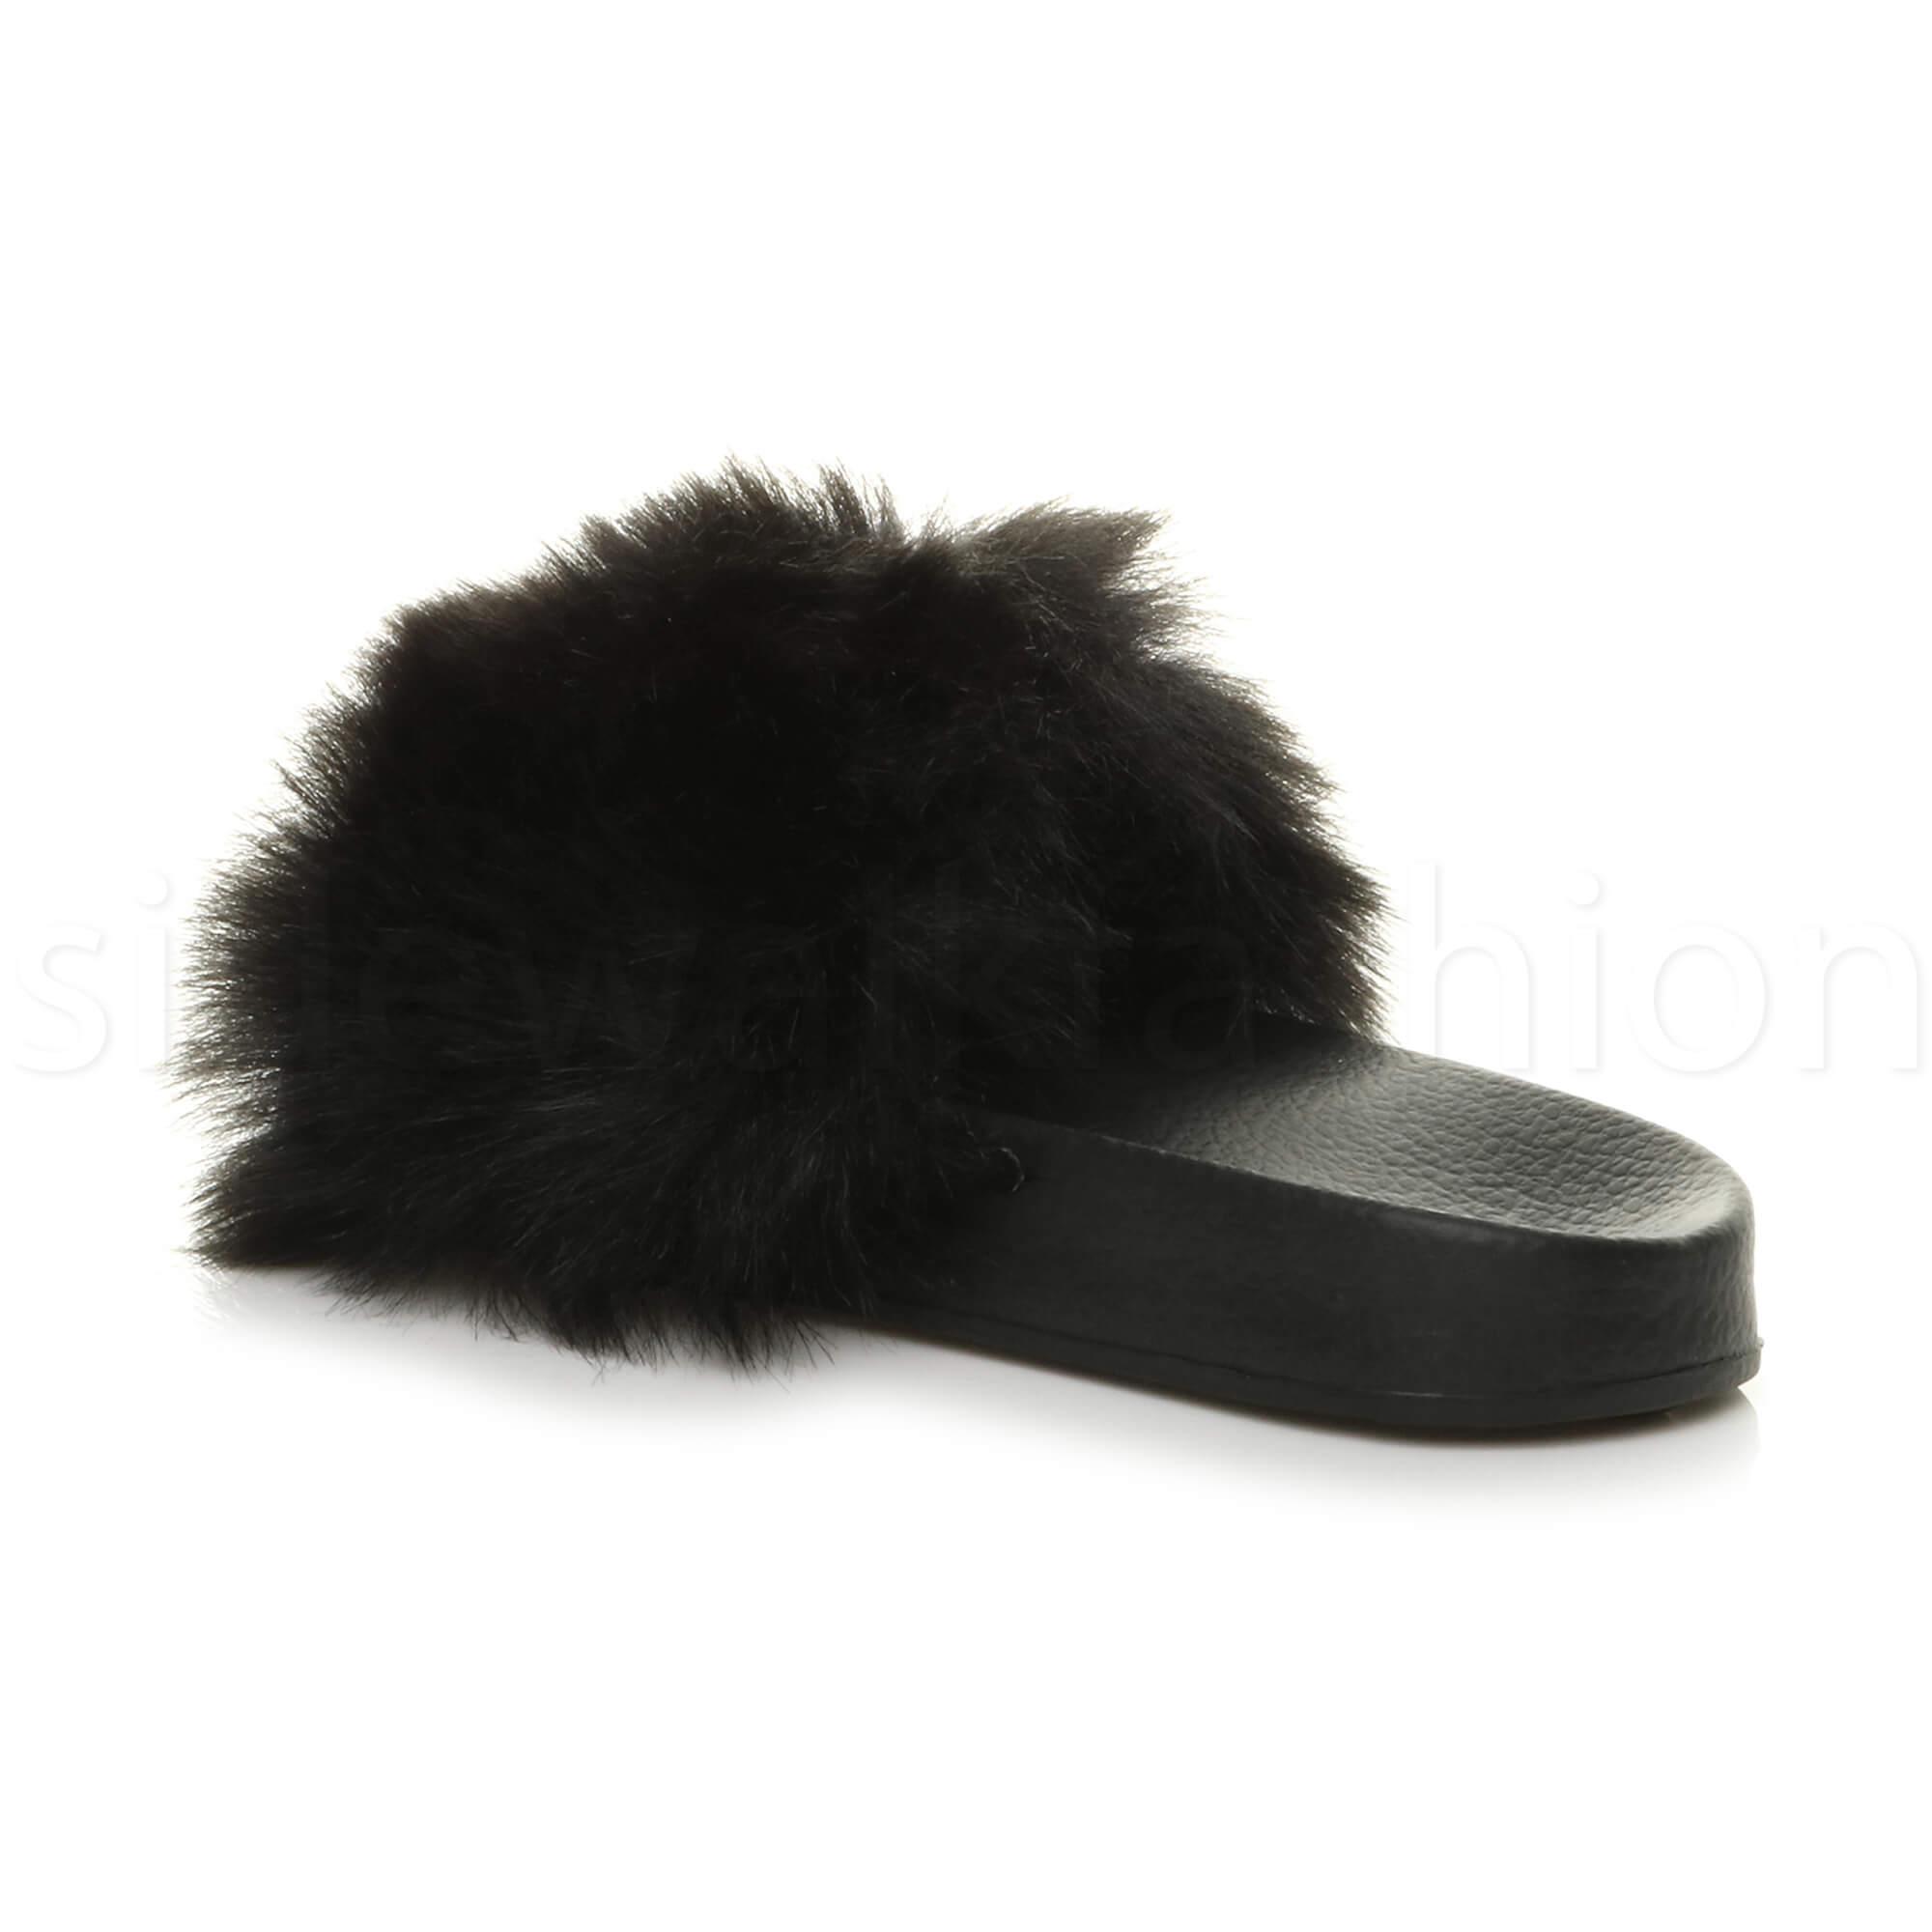 Womens ladies beaded flat casual slip on fur sliders flip flop sandals size